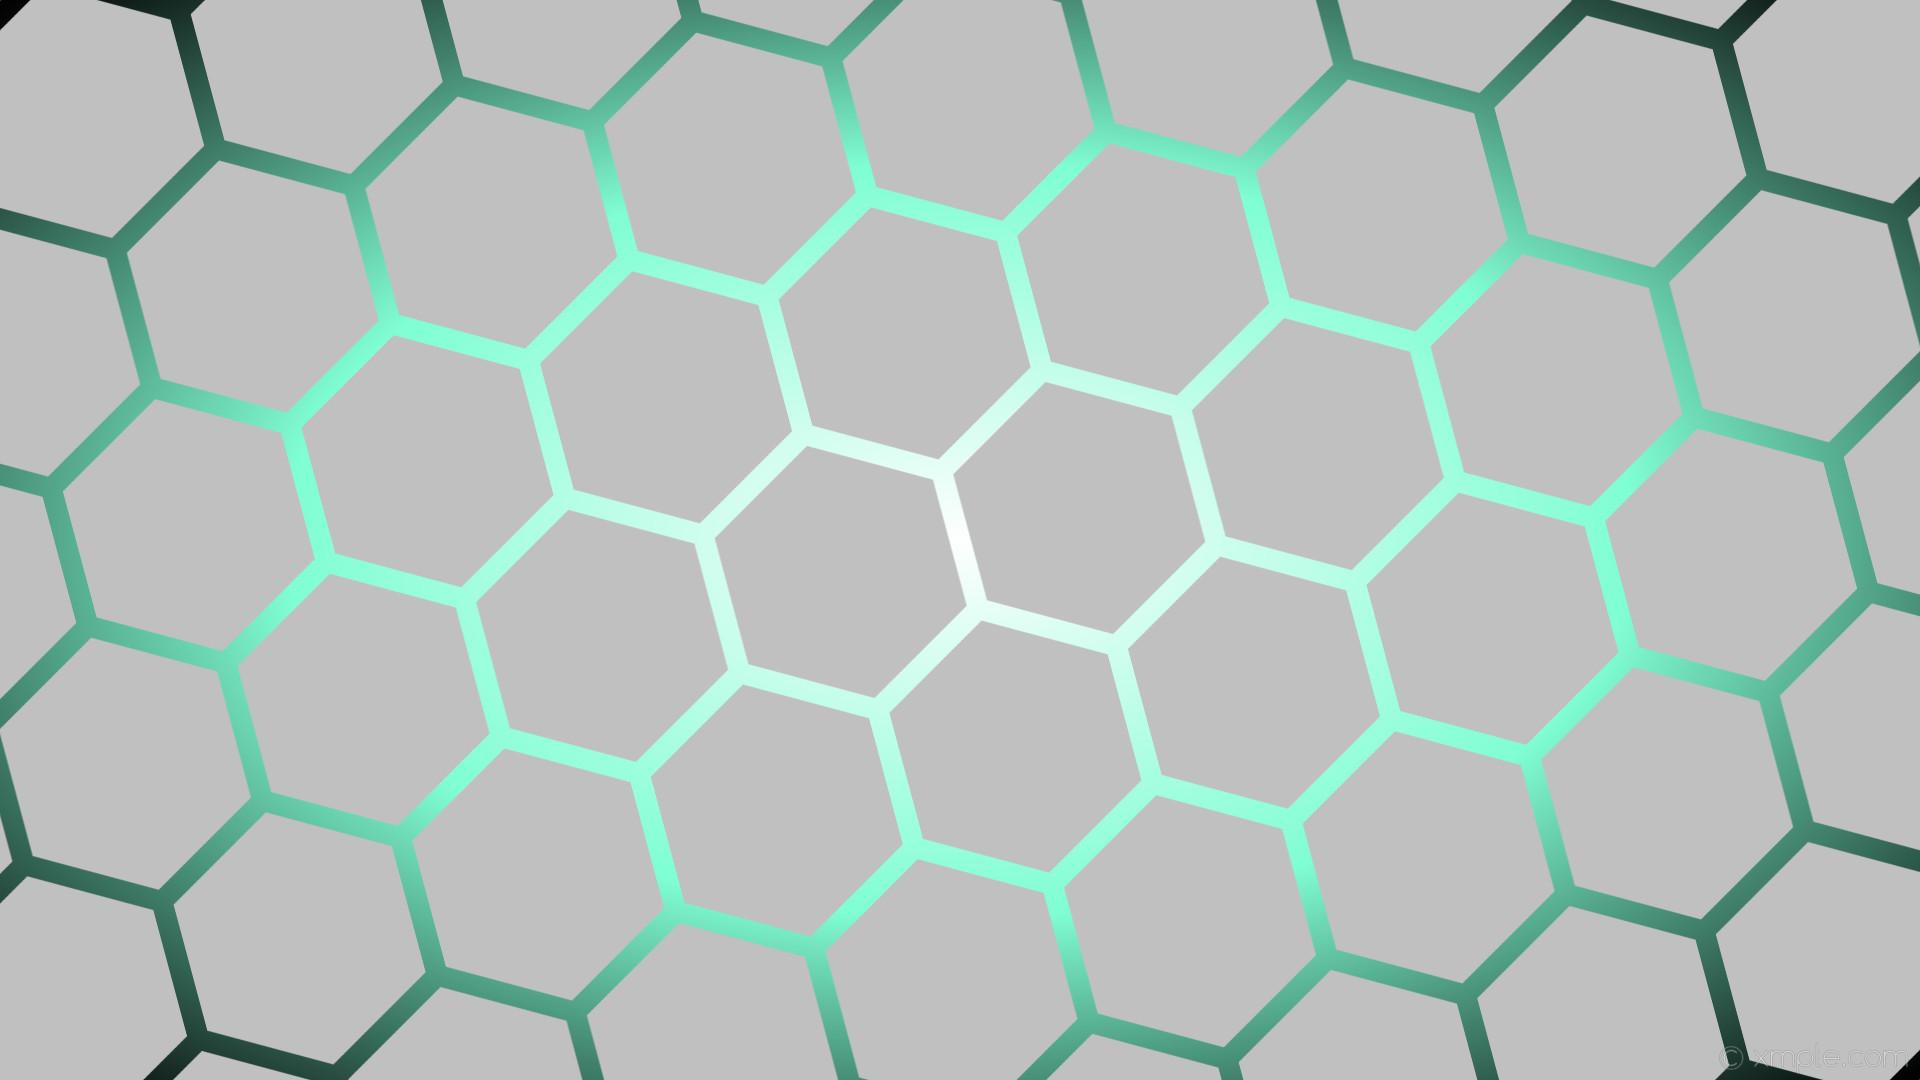 wallpaper white glow hexagon black gradient blue grey silver aquamarine  #c0c0c0 #ffffff #7fffd4